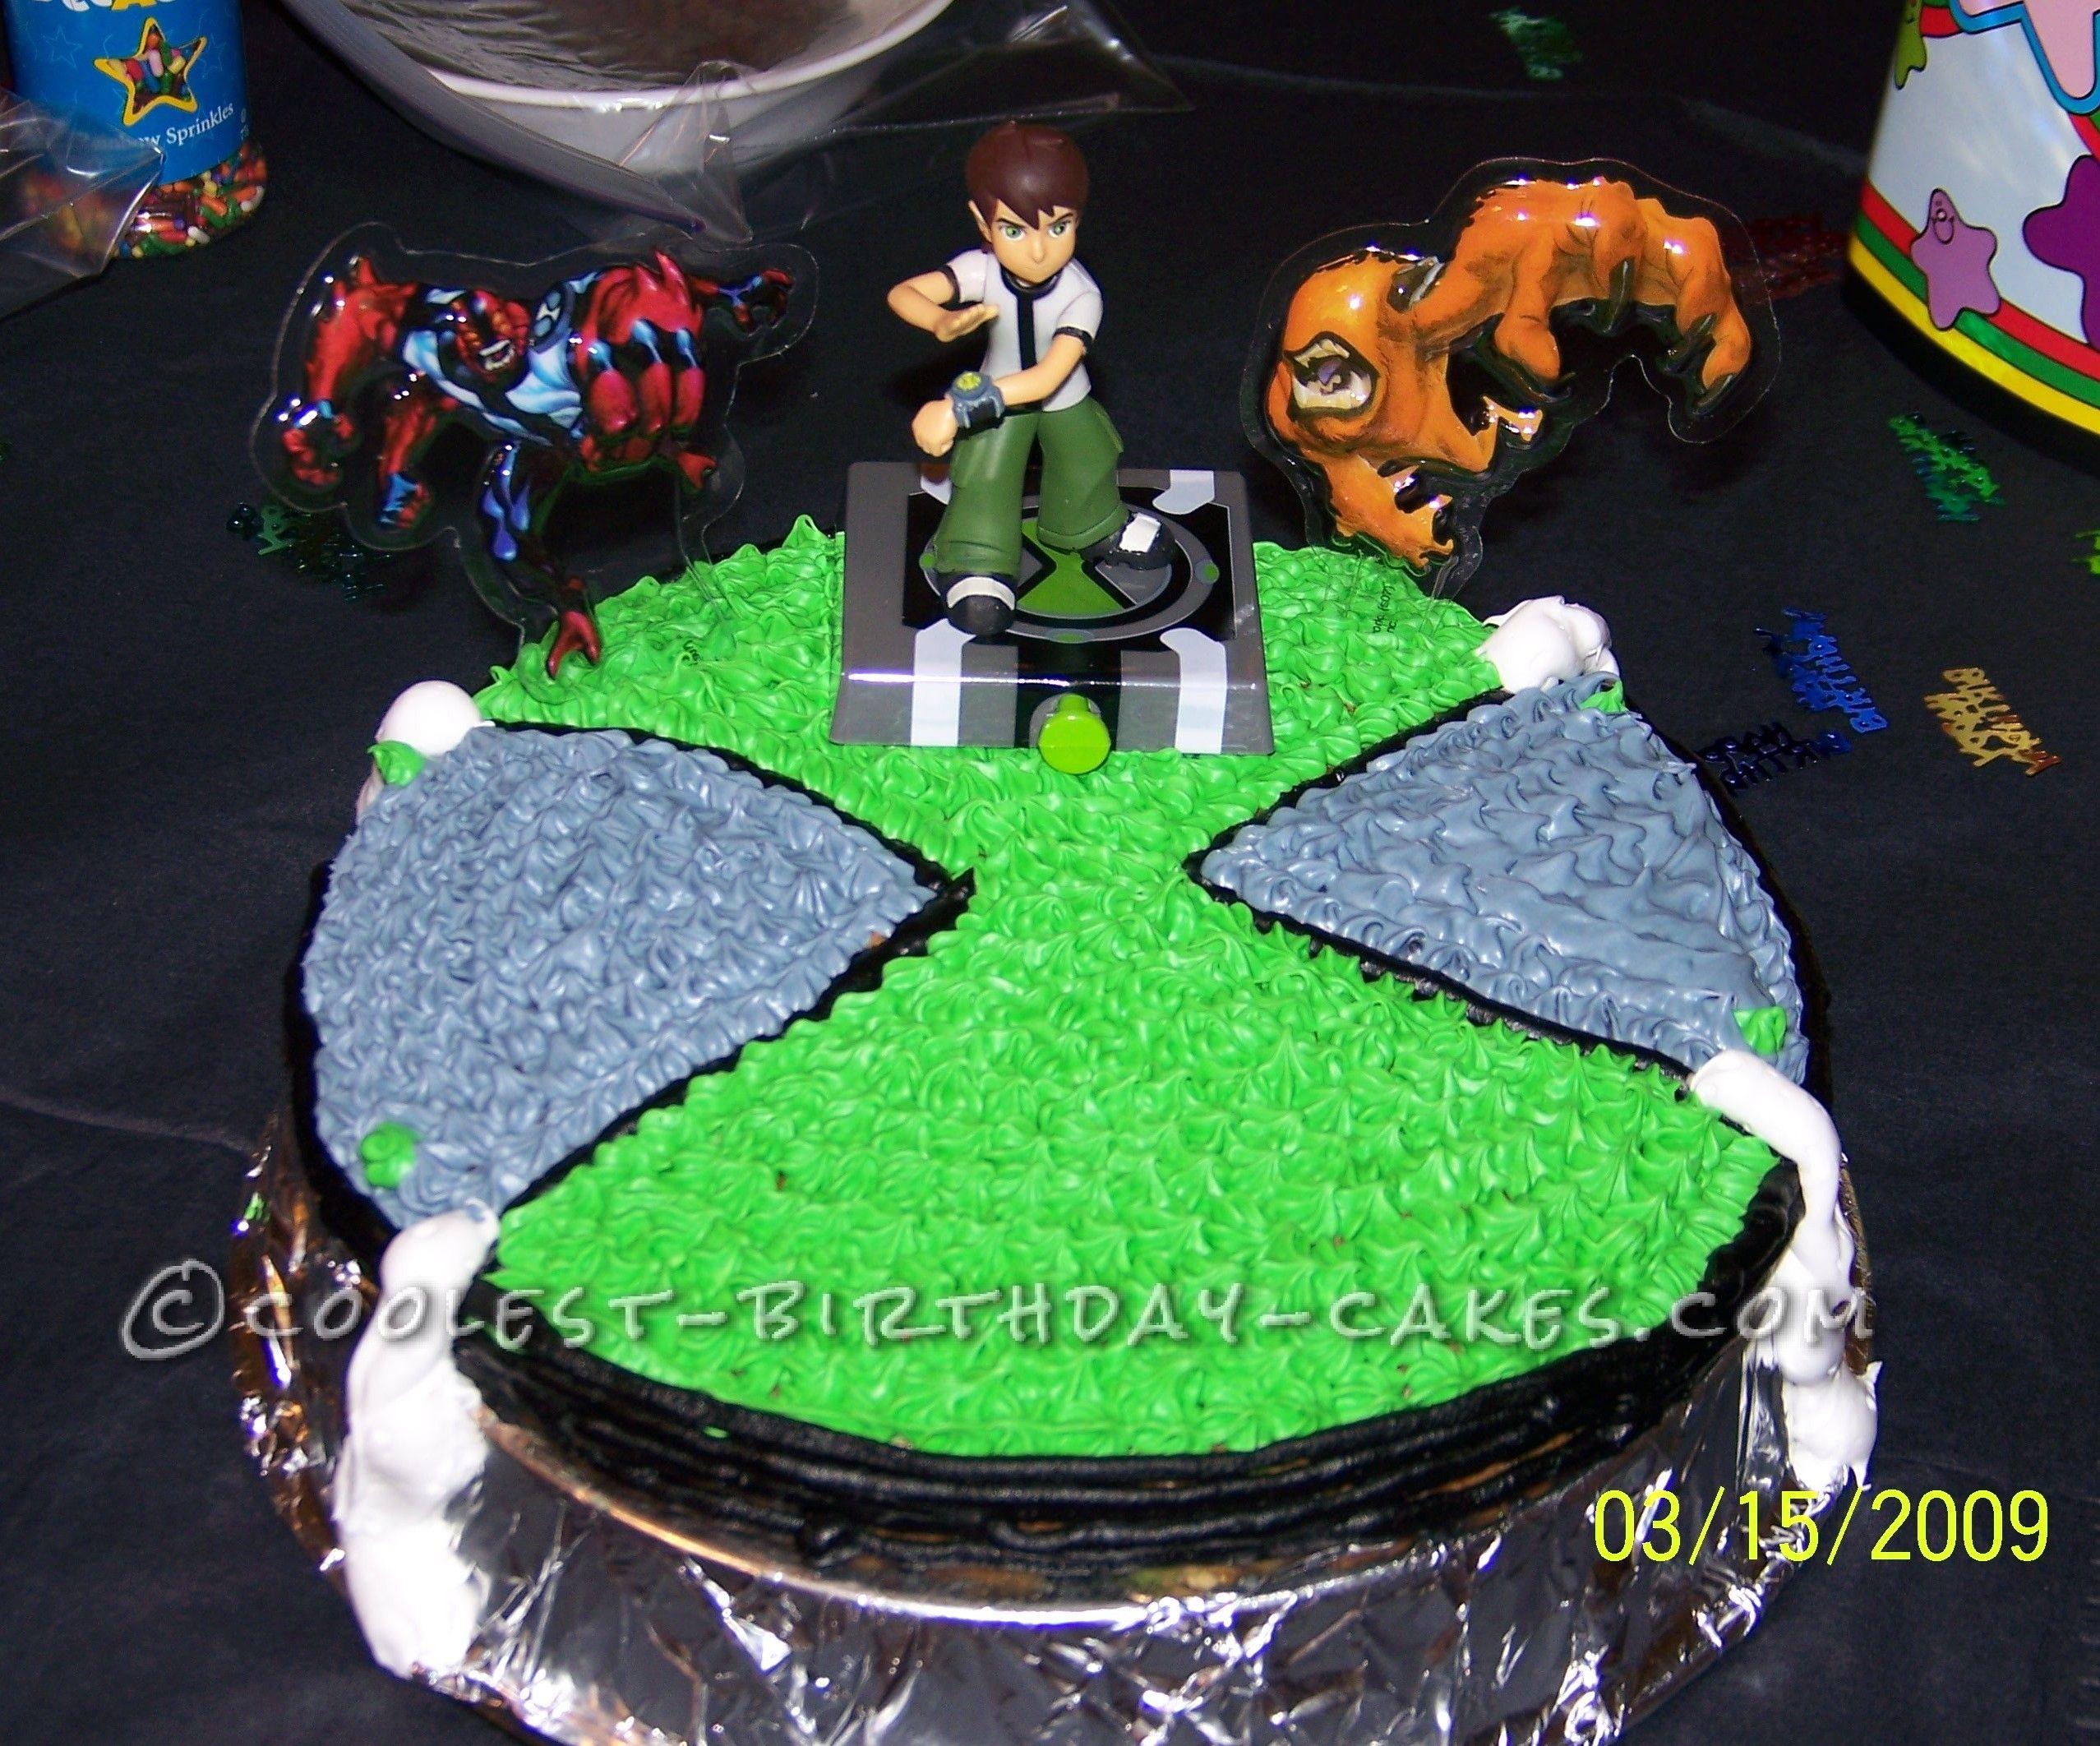 Coolest Ben 10 Birthday Cake... This website is the Pinterest of birthday cake ideas